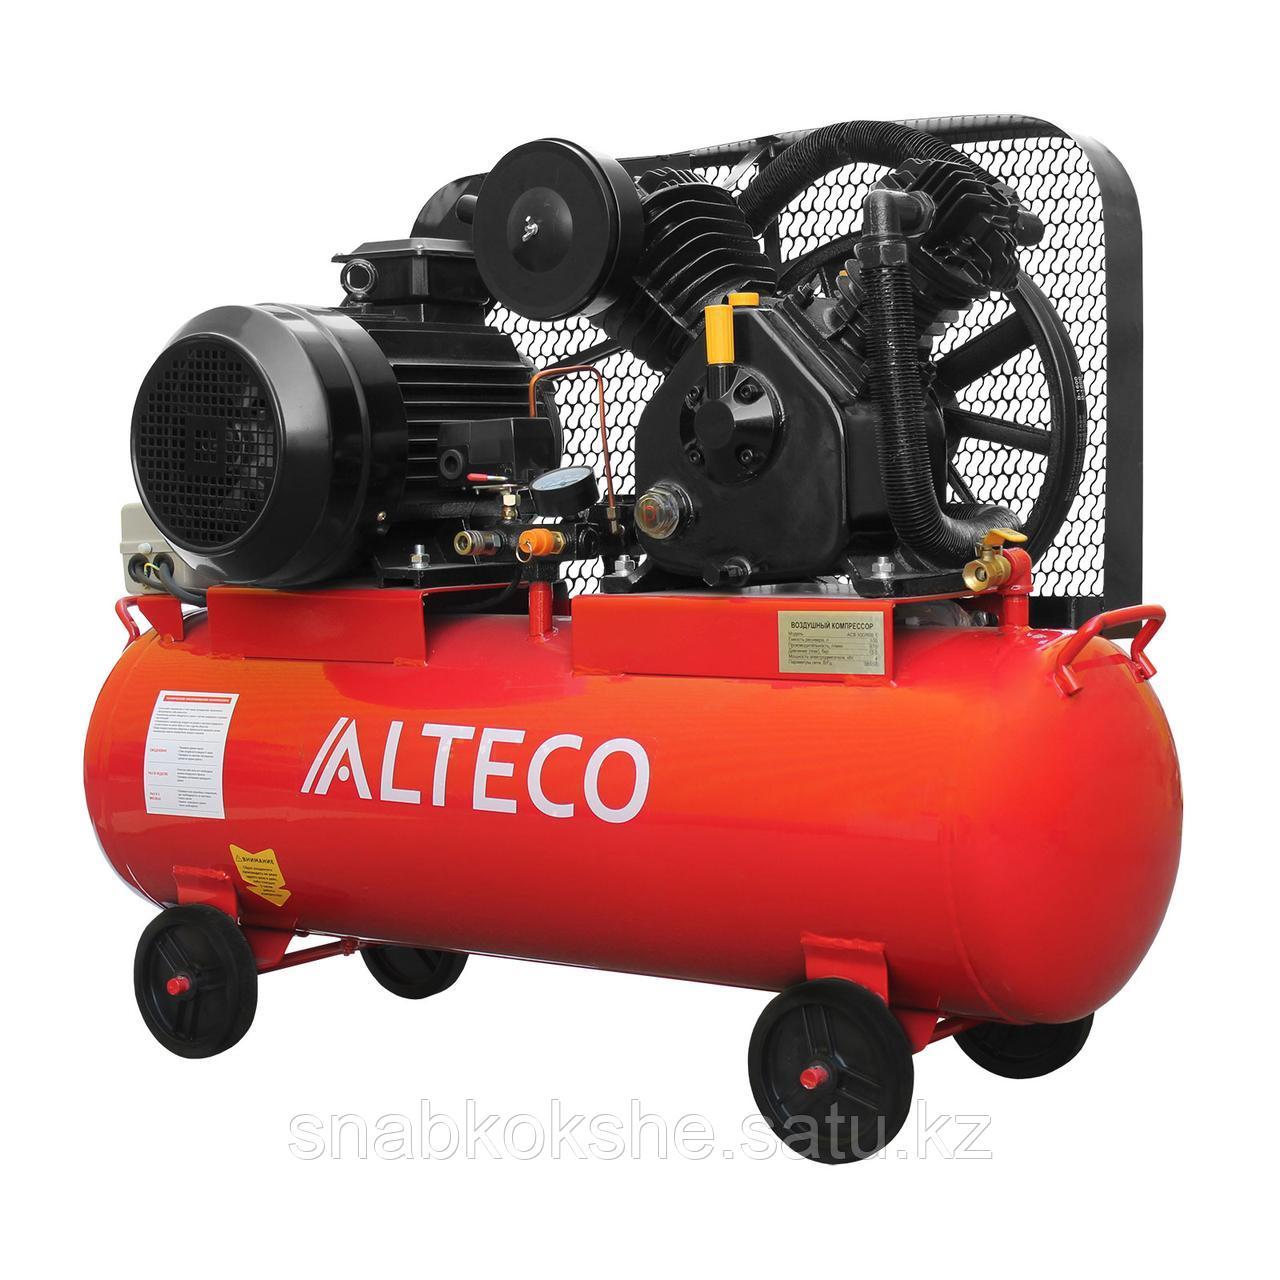 КОМПРЕССОР ALTECO ACB 100/800.1